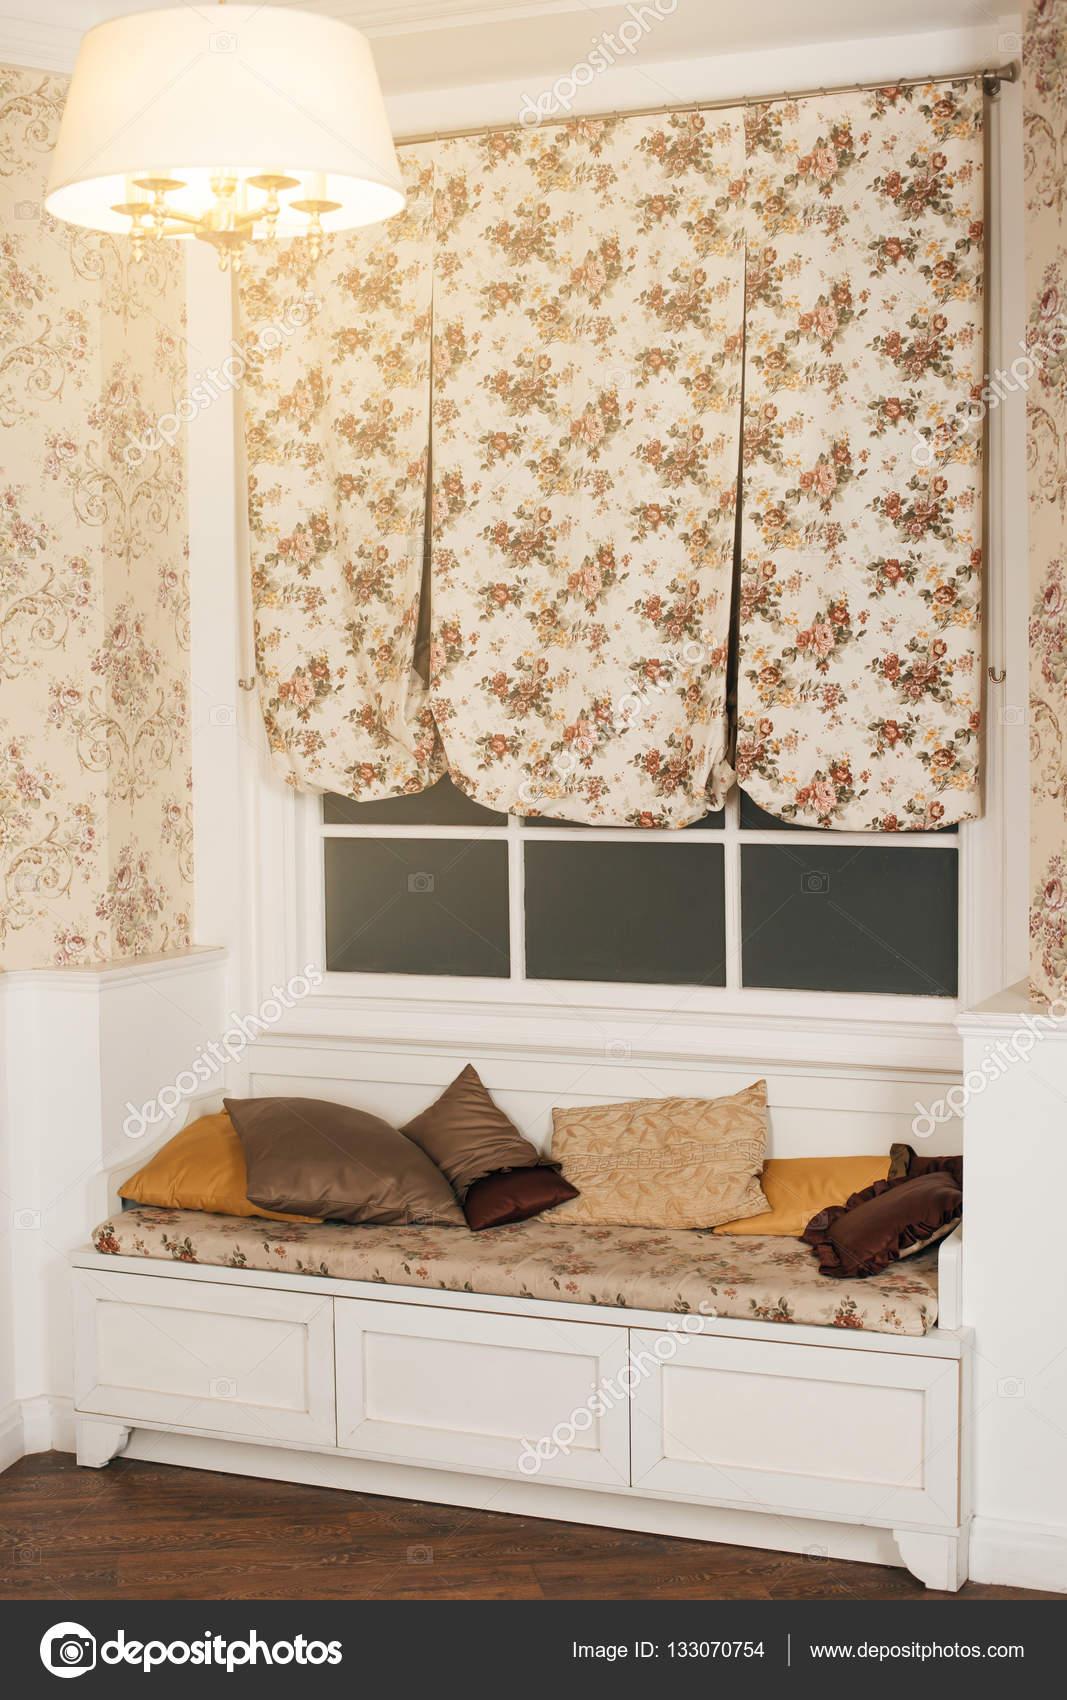 Divano Sotto La Finestra.Sofa With Pillows Under Big Window Stock Photo C Nomadsoul1